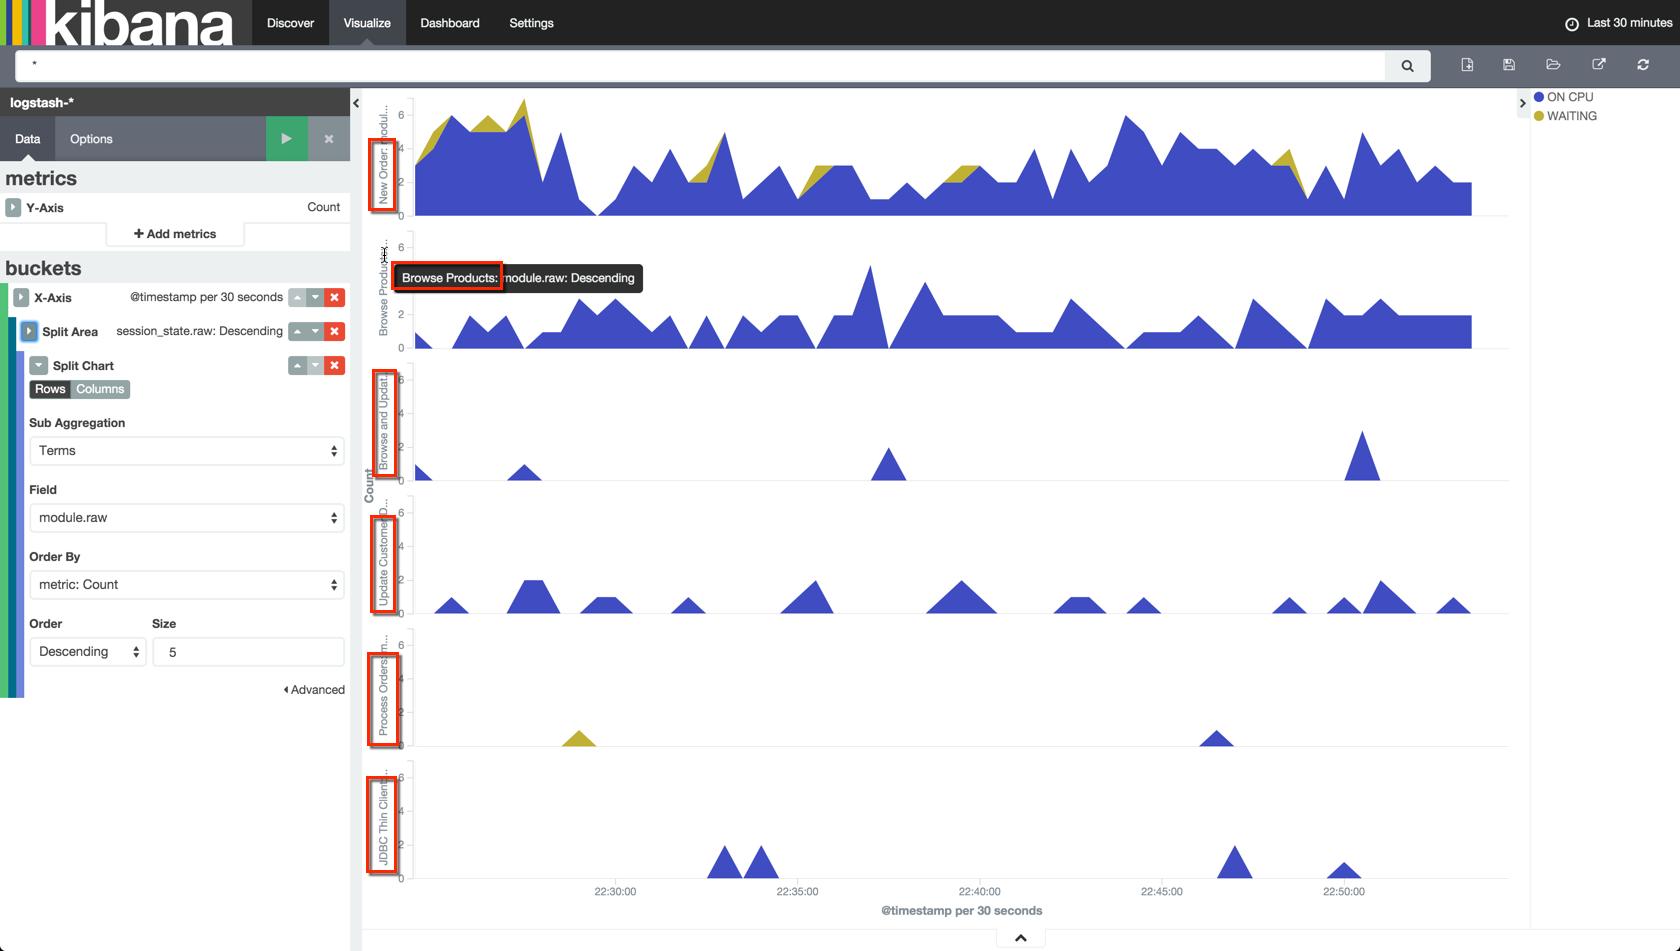 kibana-module-visualization.png